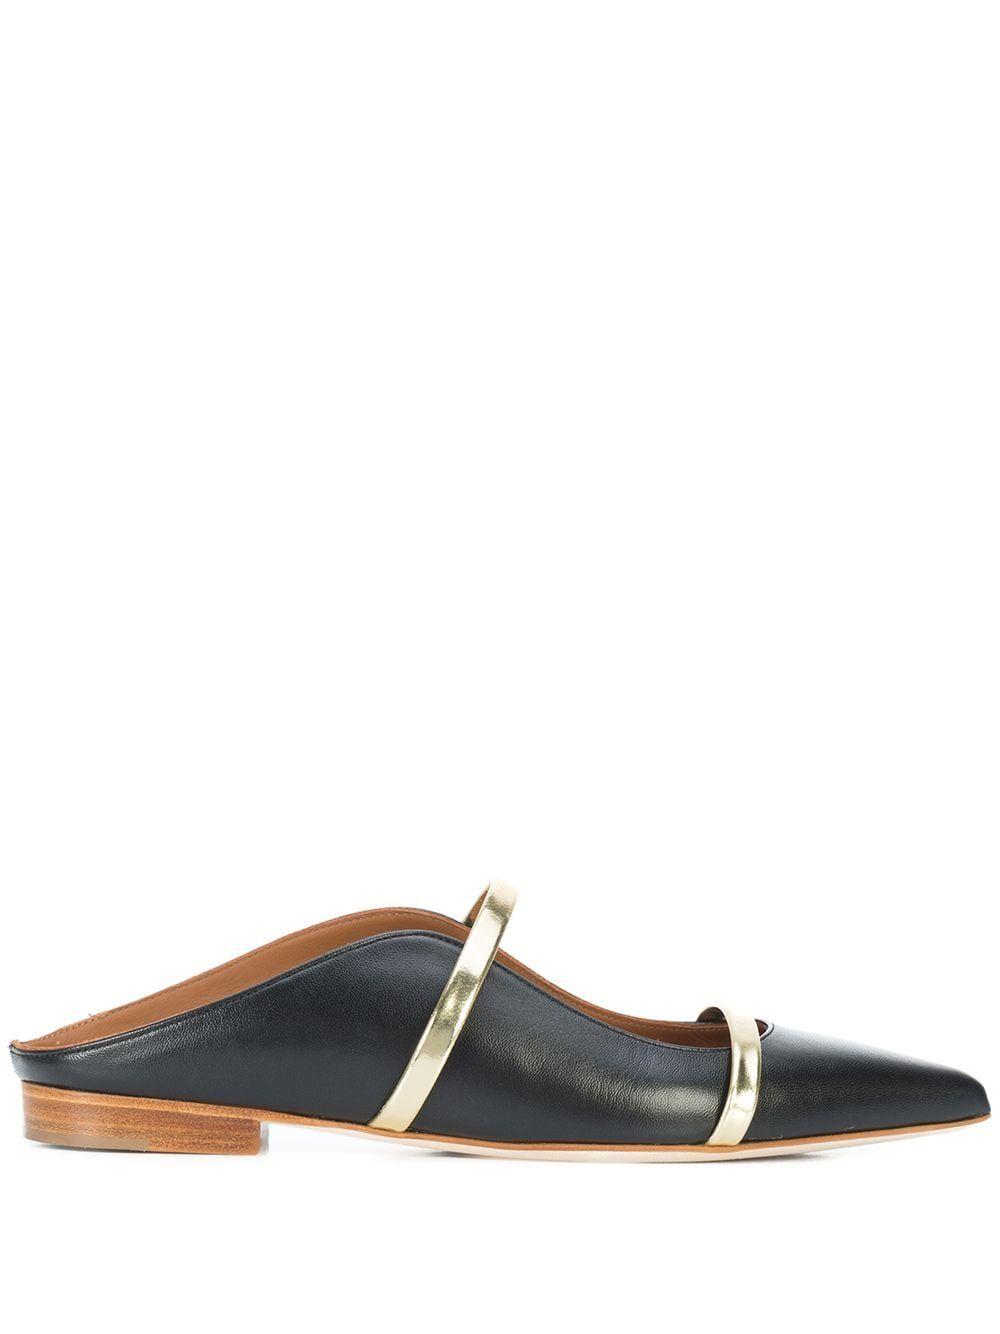 Maureen flat leather slippers